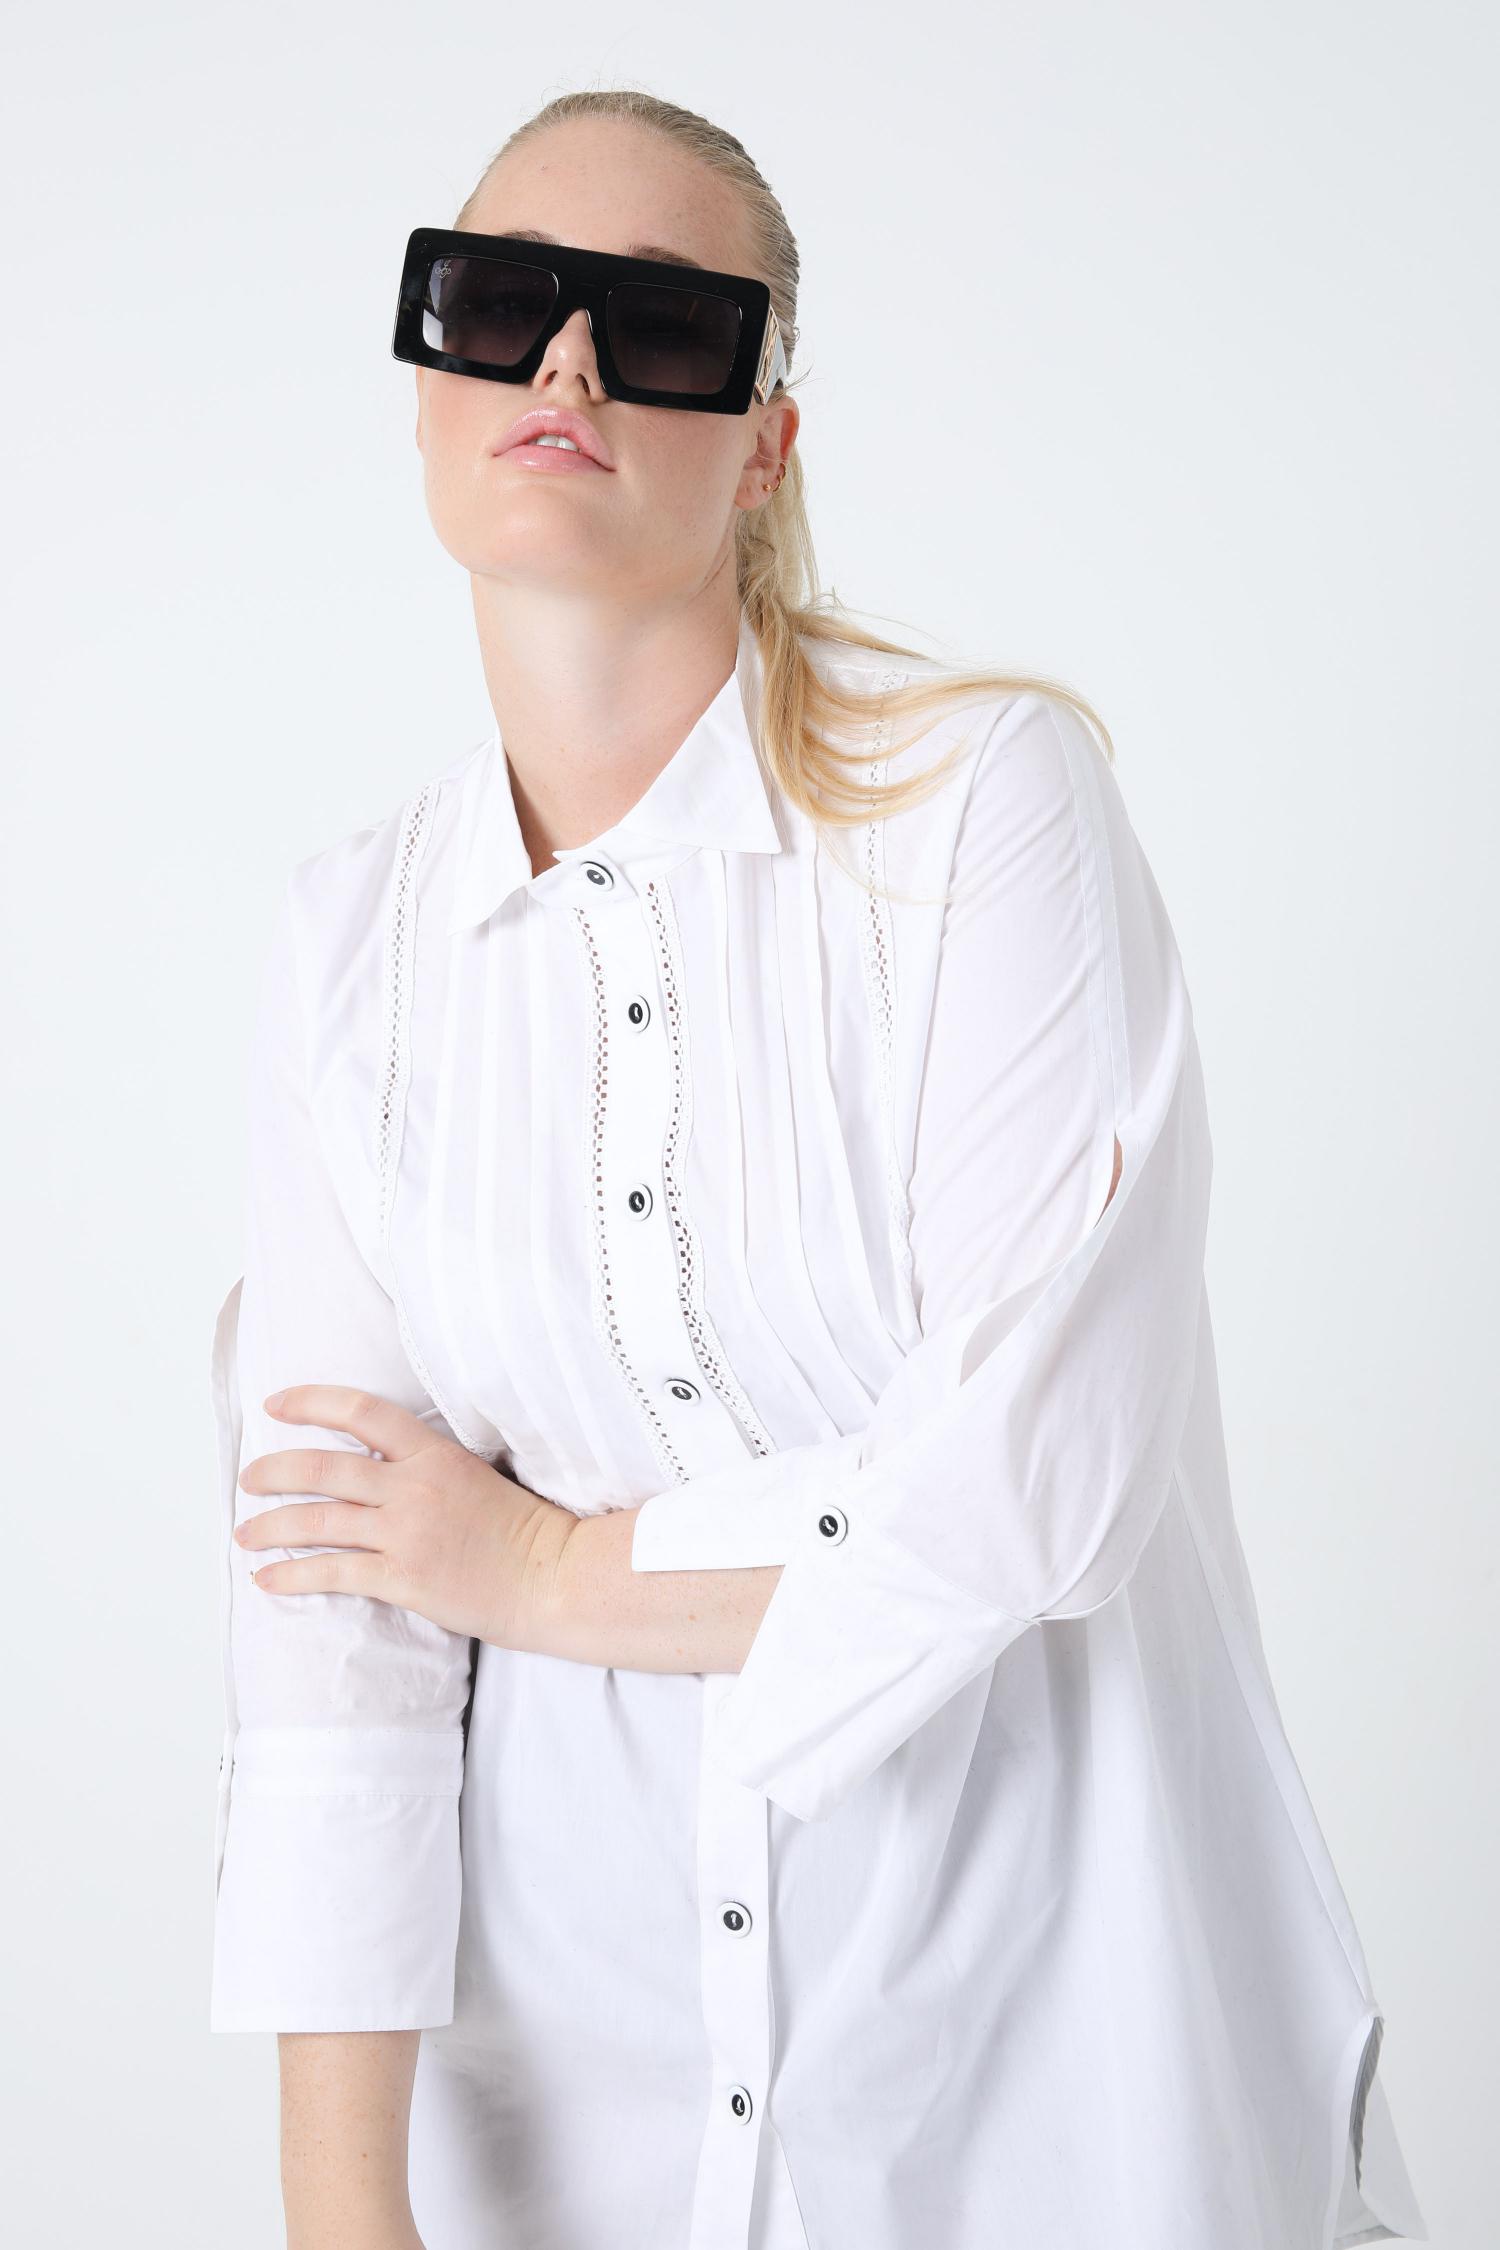 Long shirt with bib (Expedition September 25/30 September)